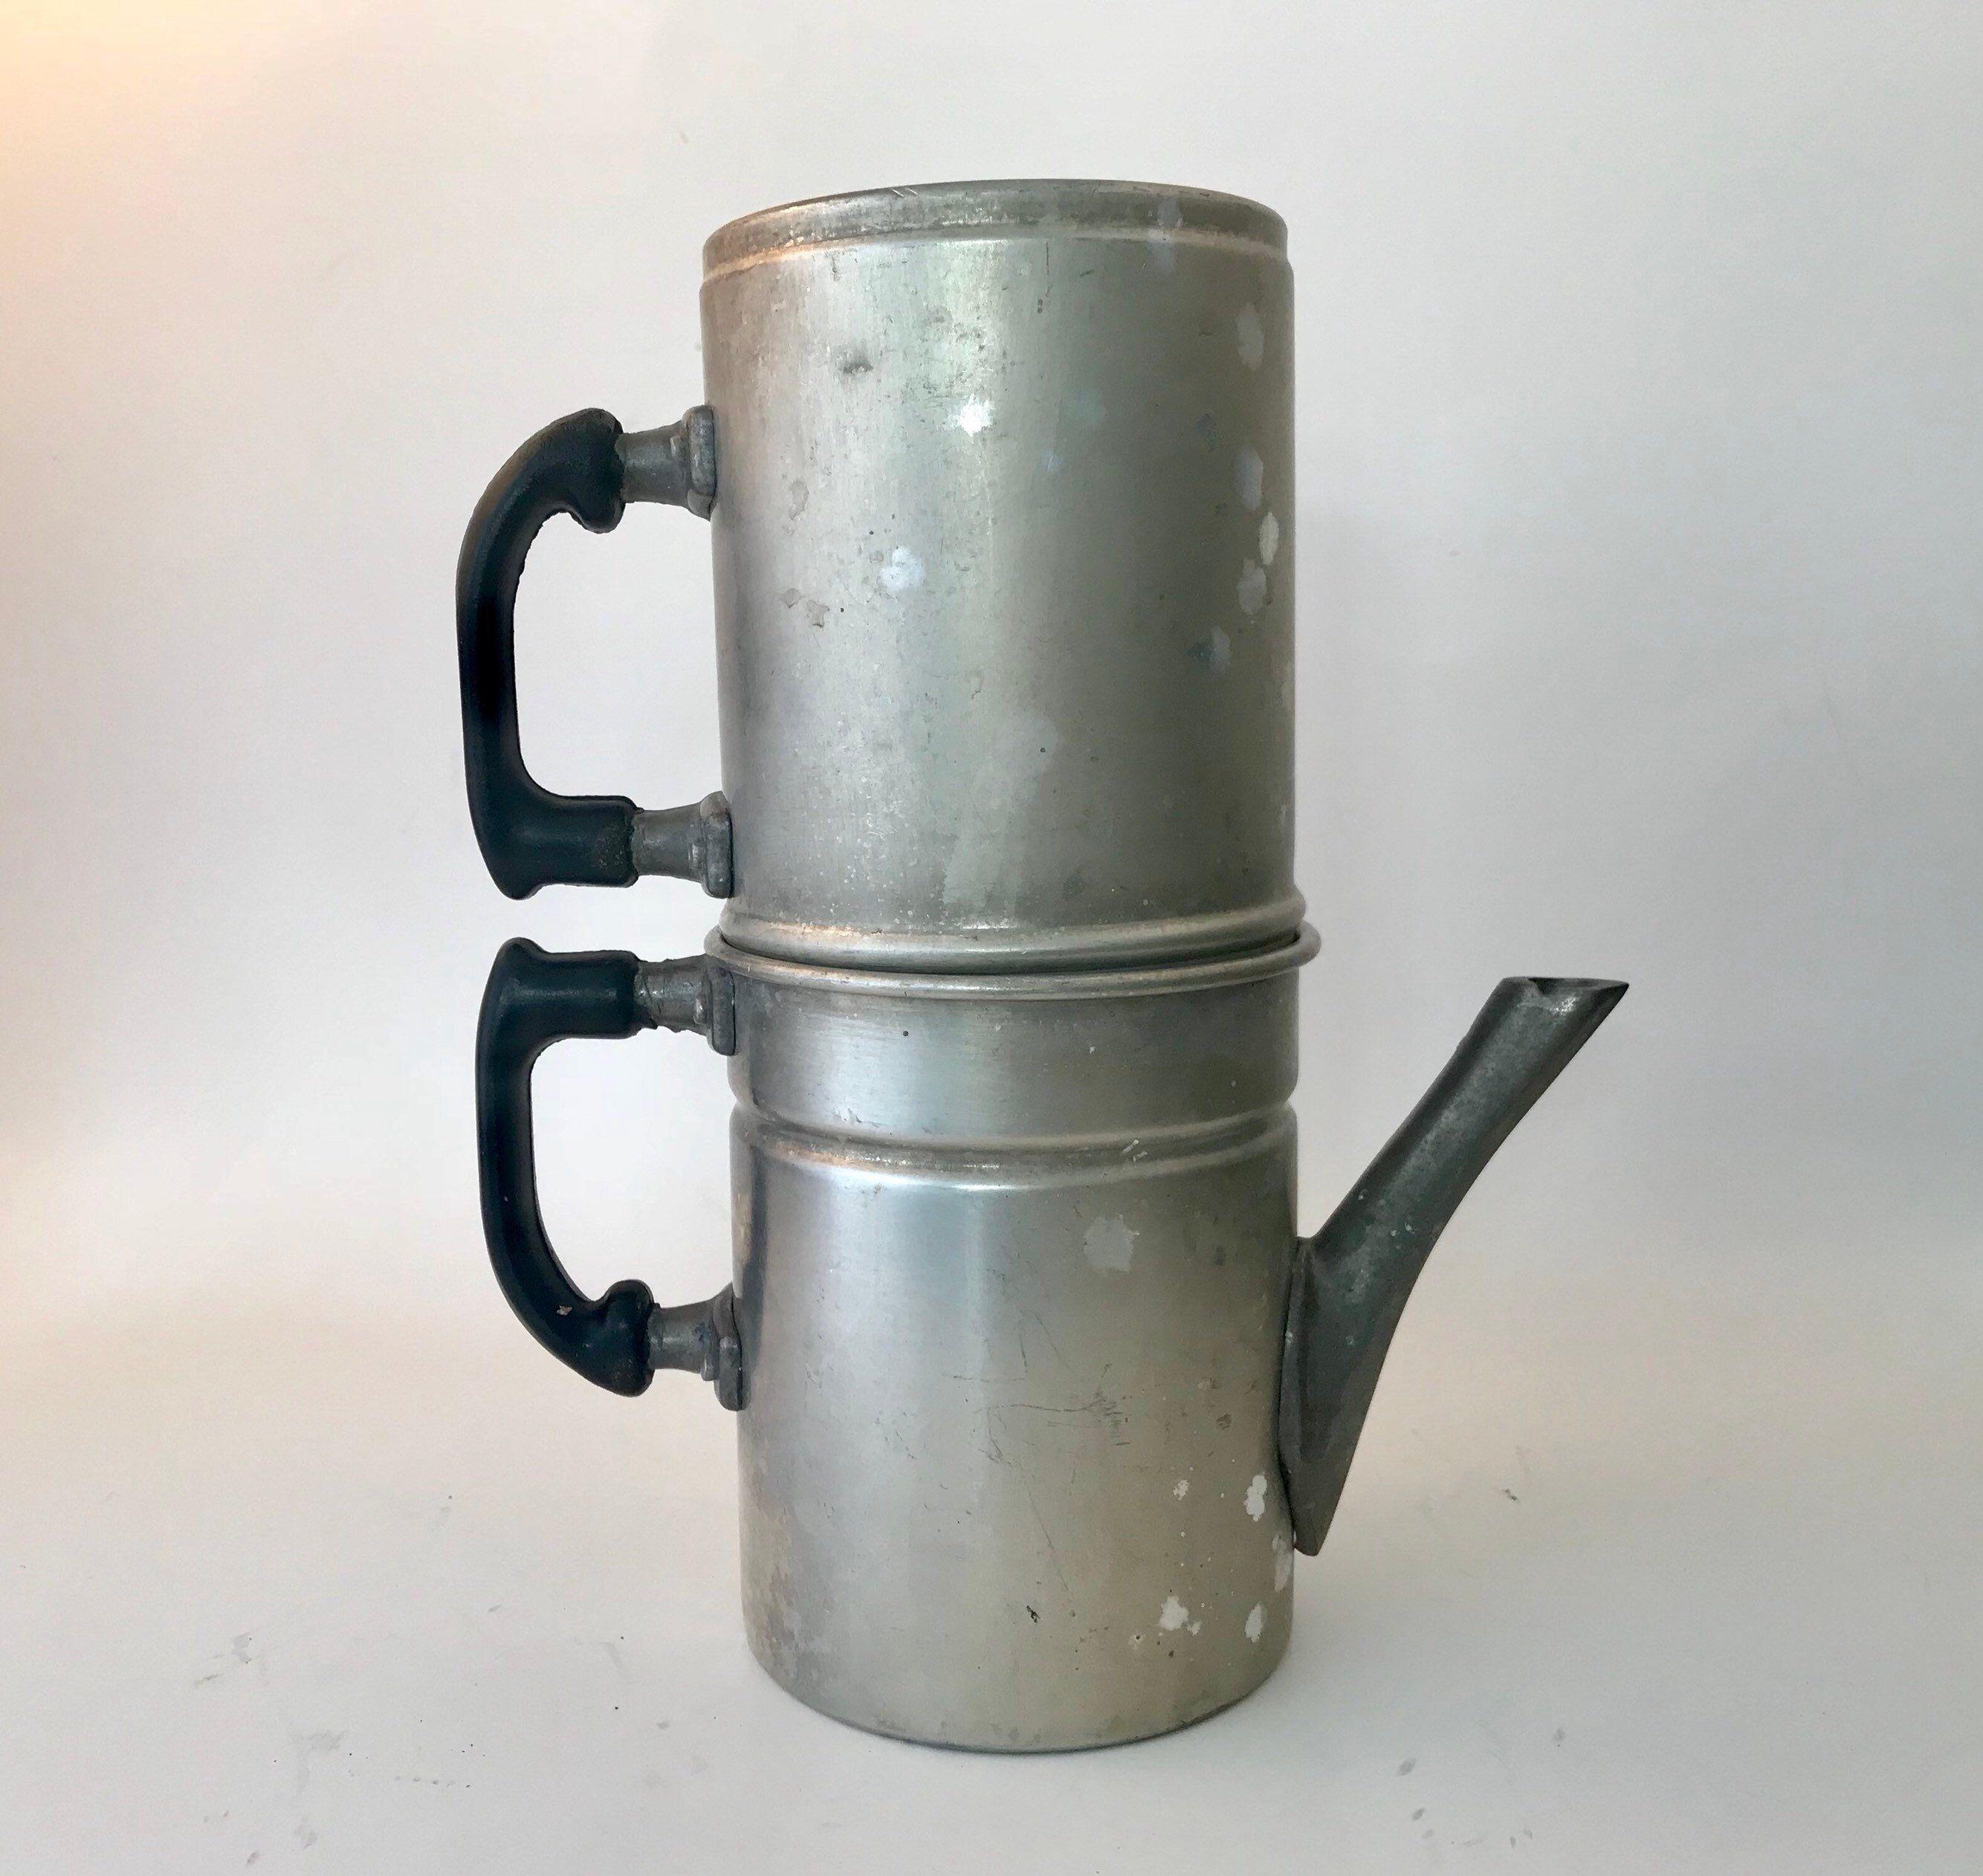 Vintage Espresso Maker Flip drip made in Italy. Old